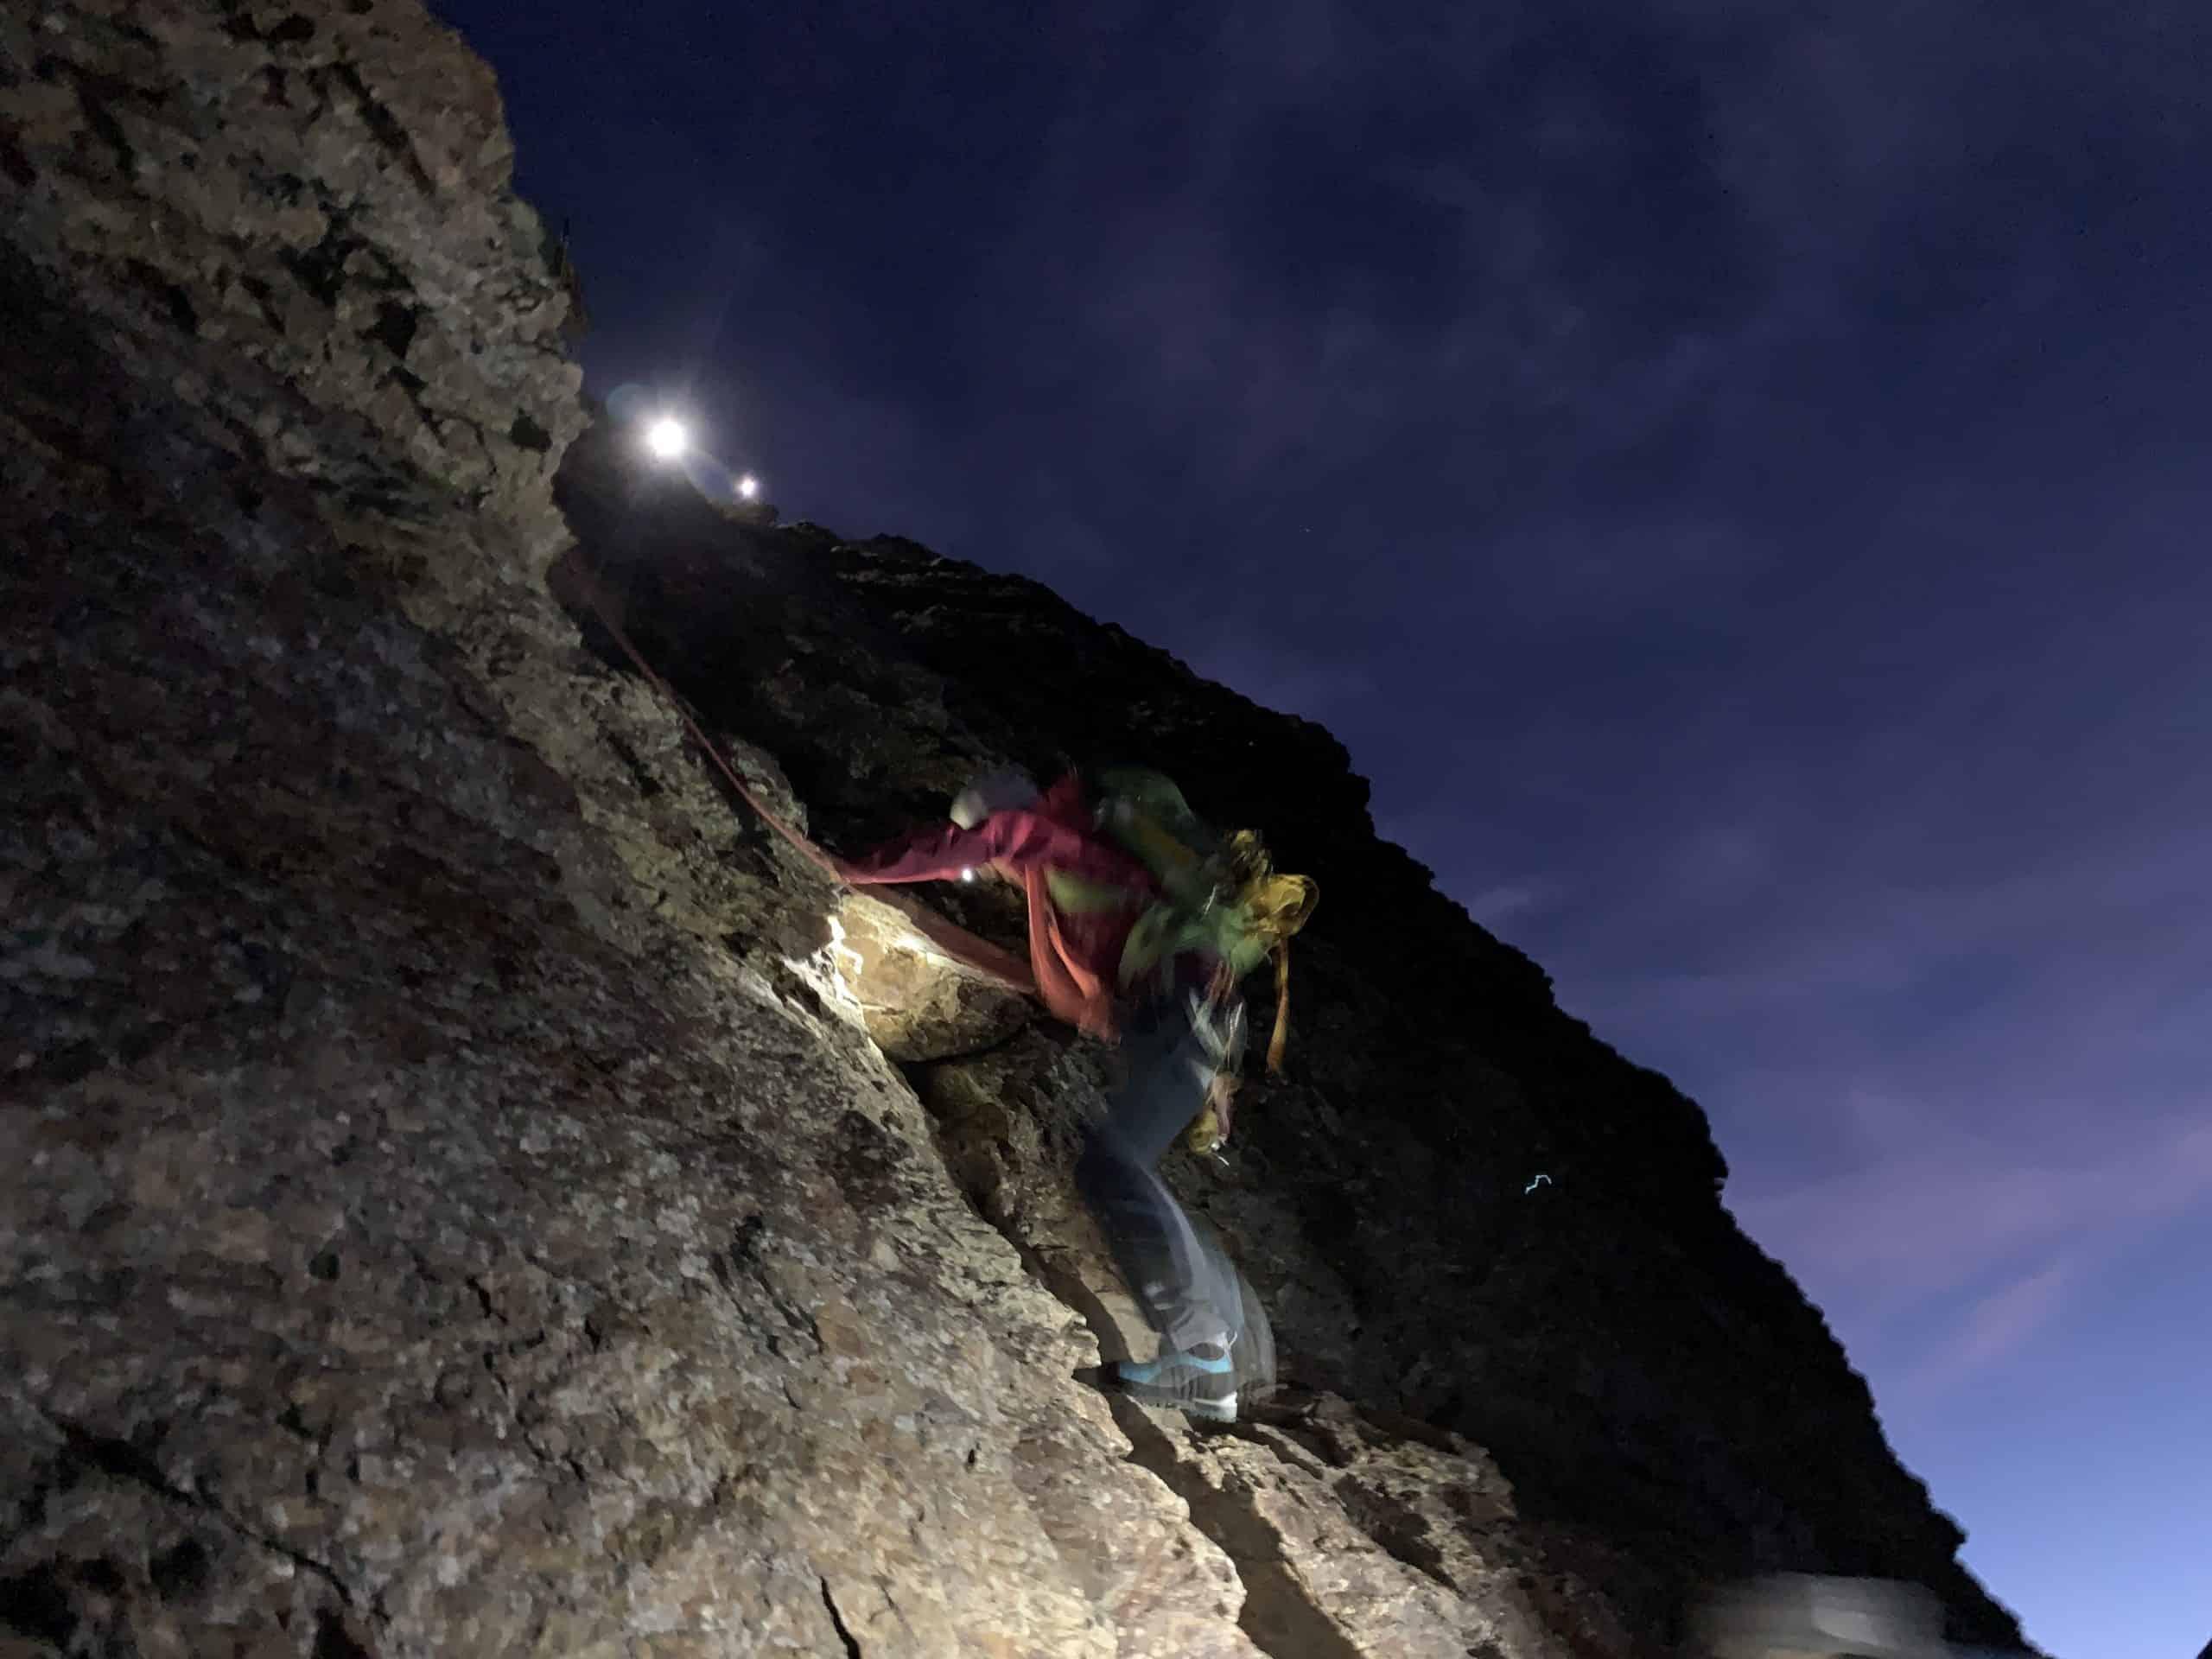 IMG 3843 scaled - Jungfrau - der Star im Berner Oberland